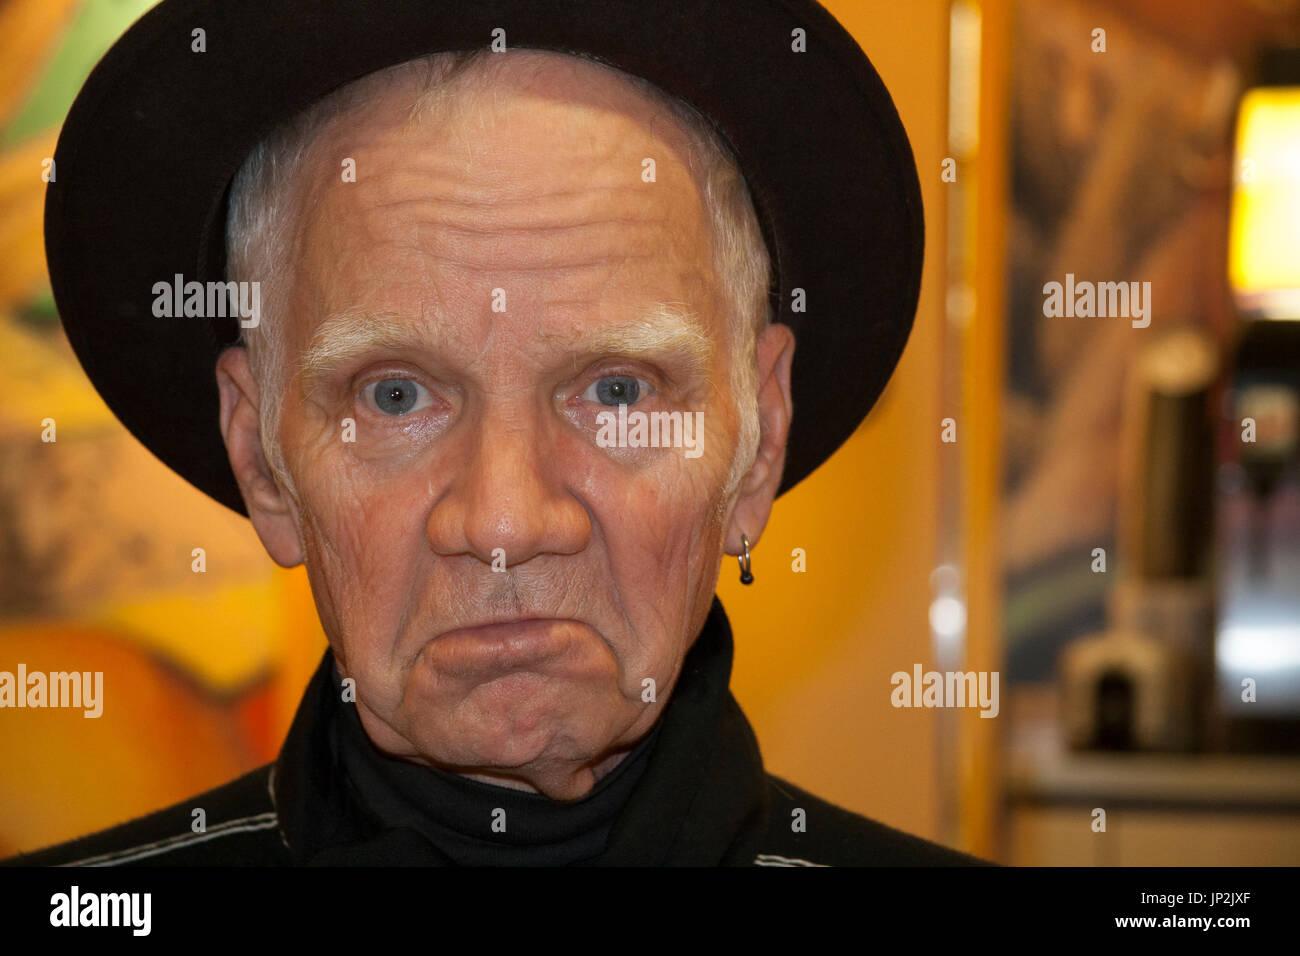 Portrait of Michael J Pollard celebrity character actor - Stock Image